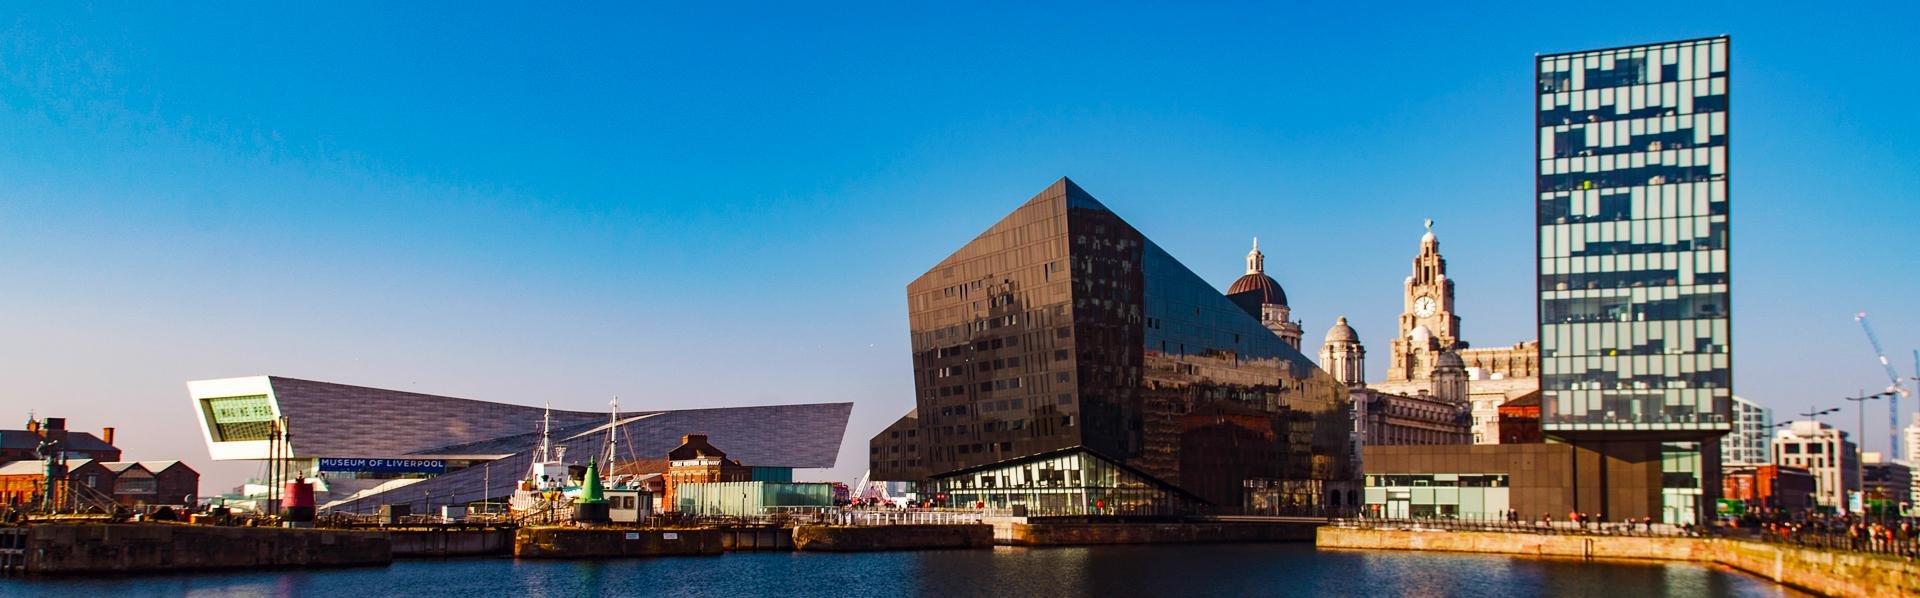 Liverpool, Groot-Brittannië